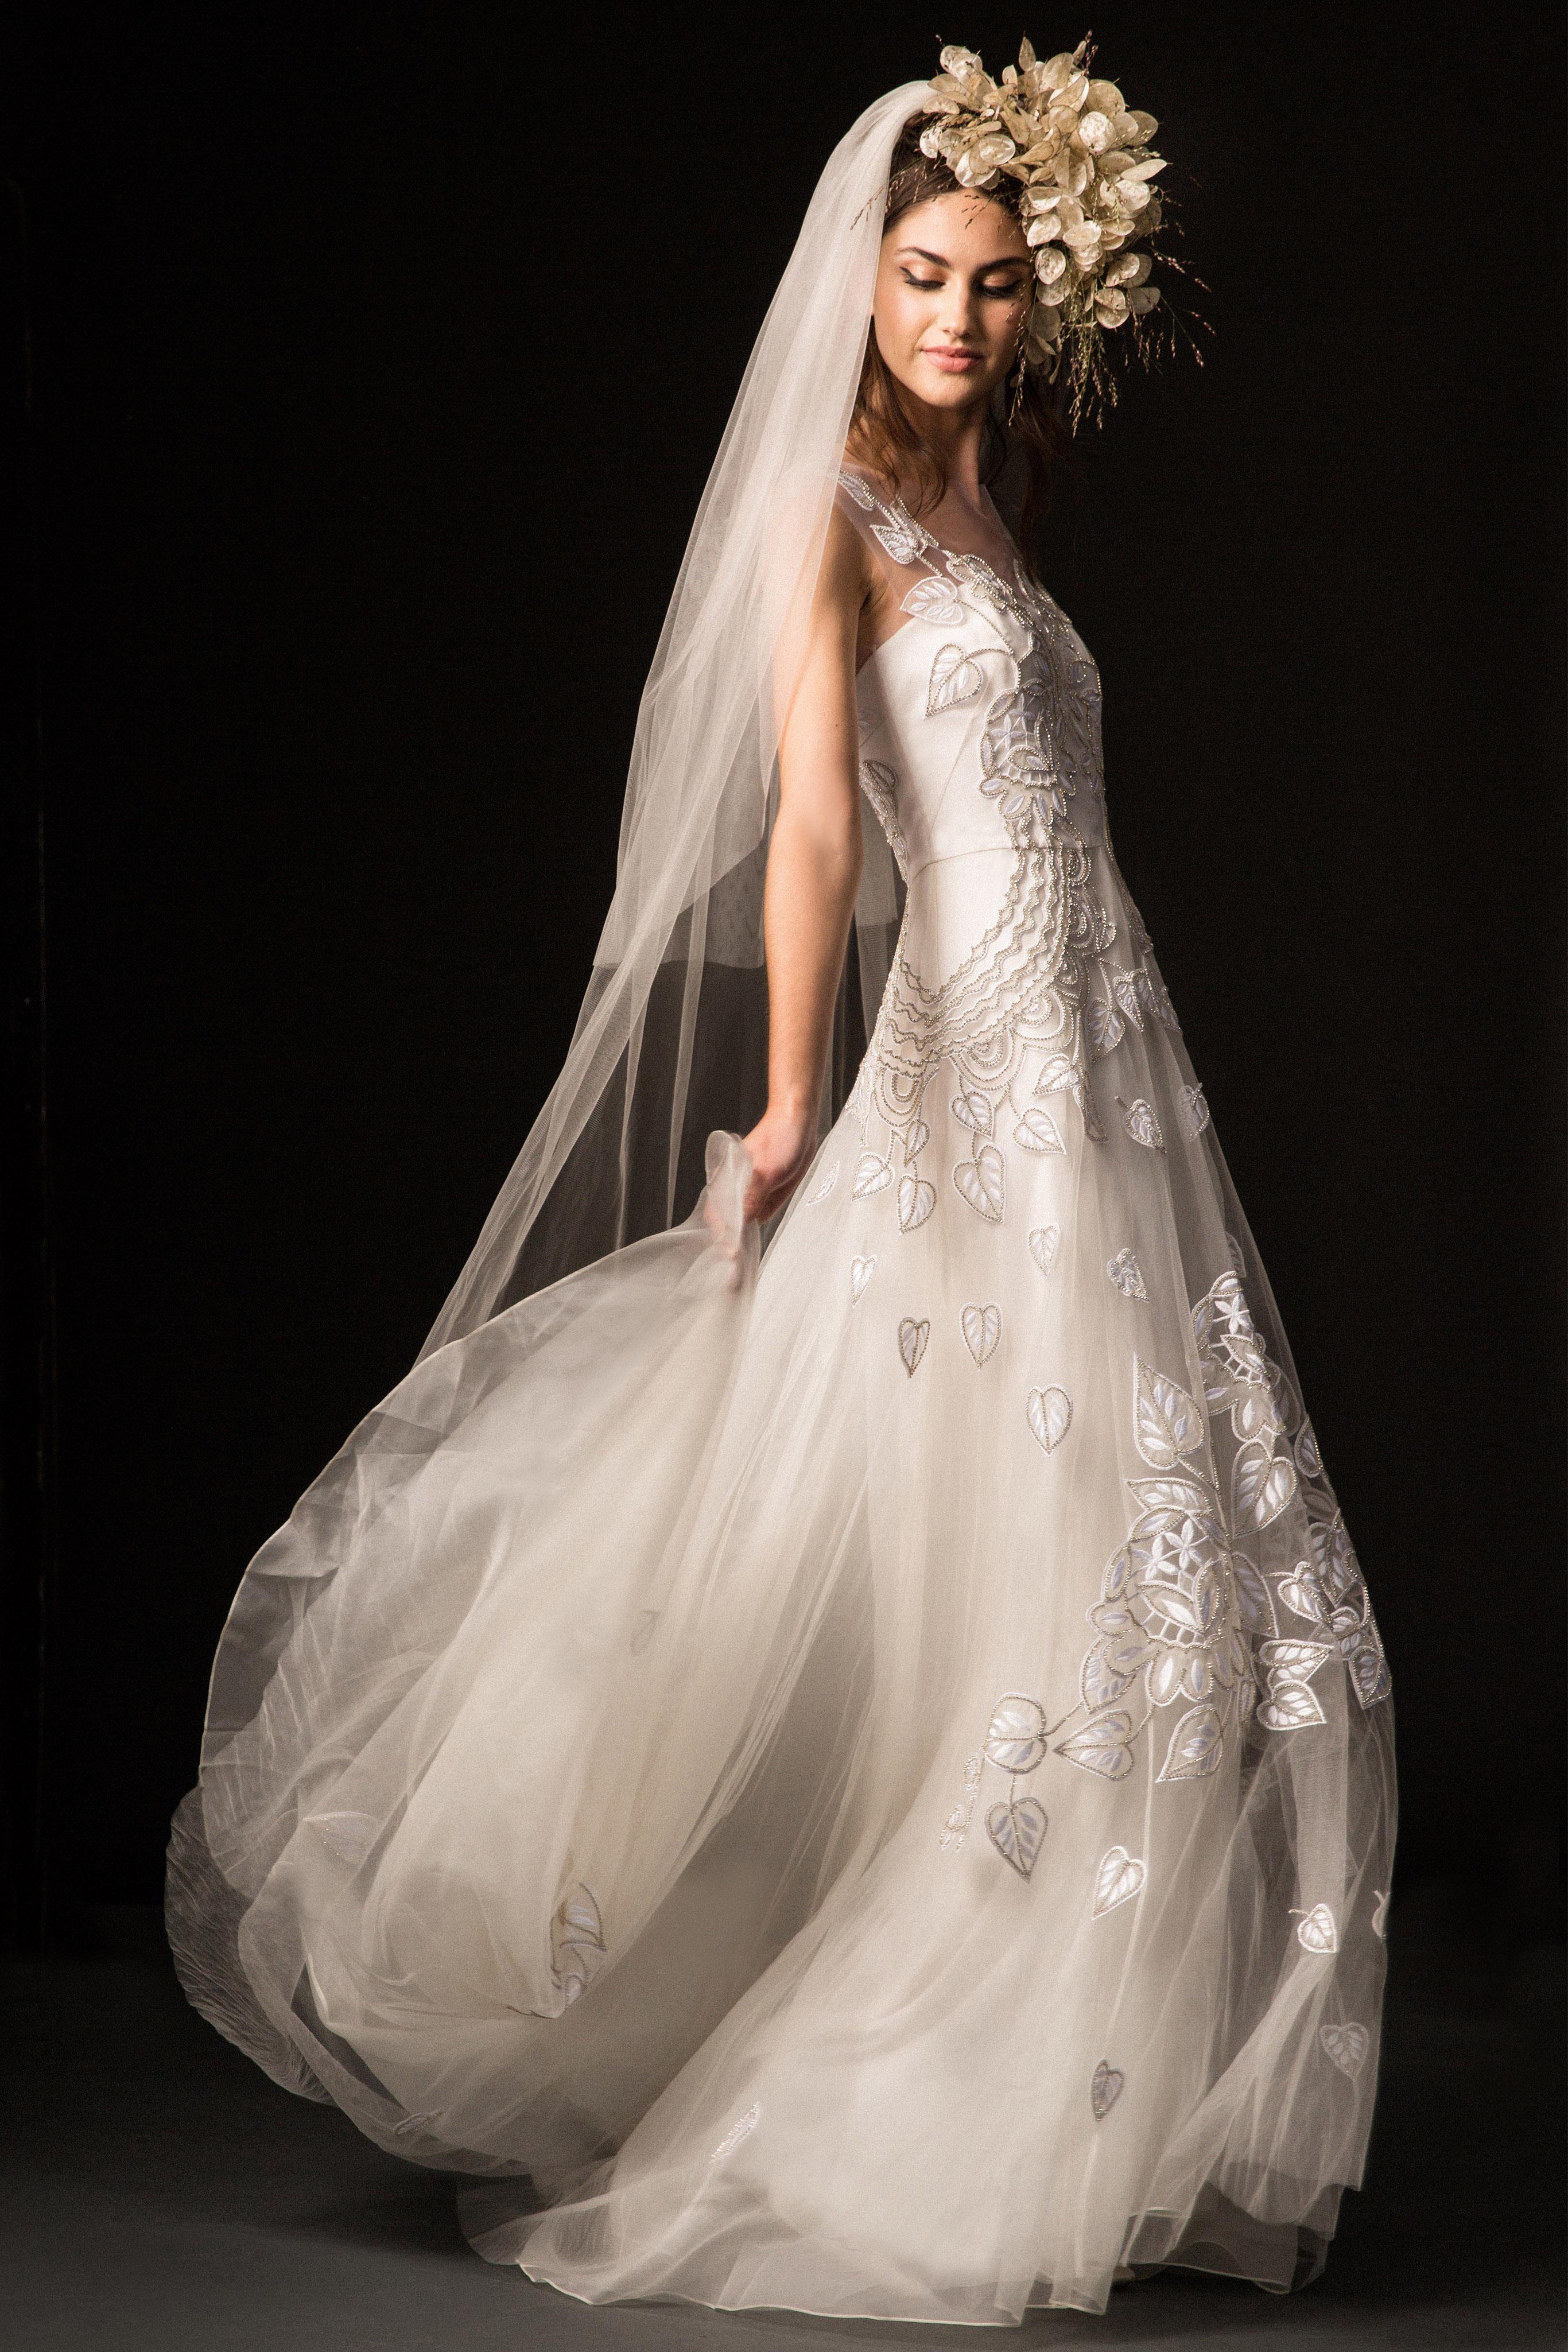 temperley fall 2019 floral applique a-line wedding dress